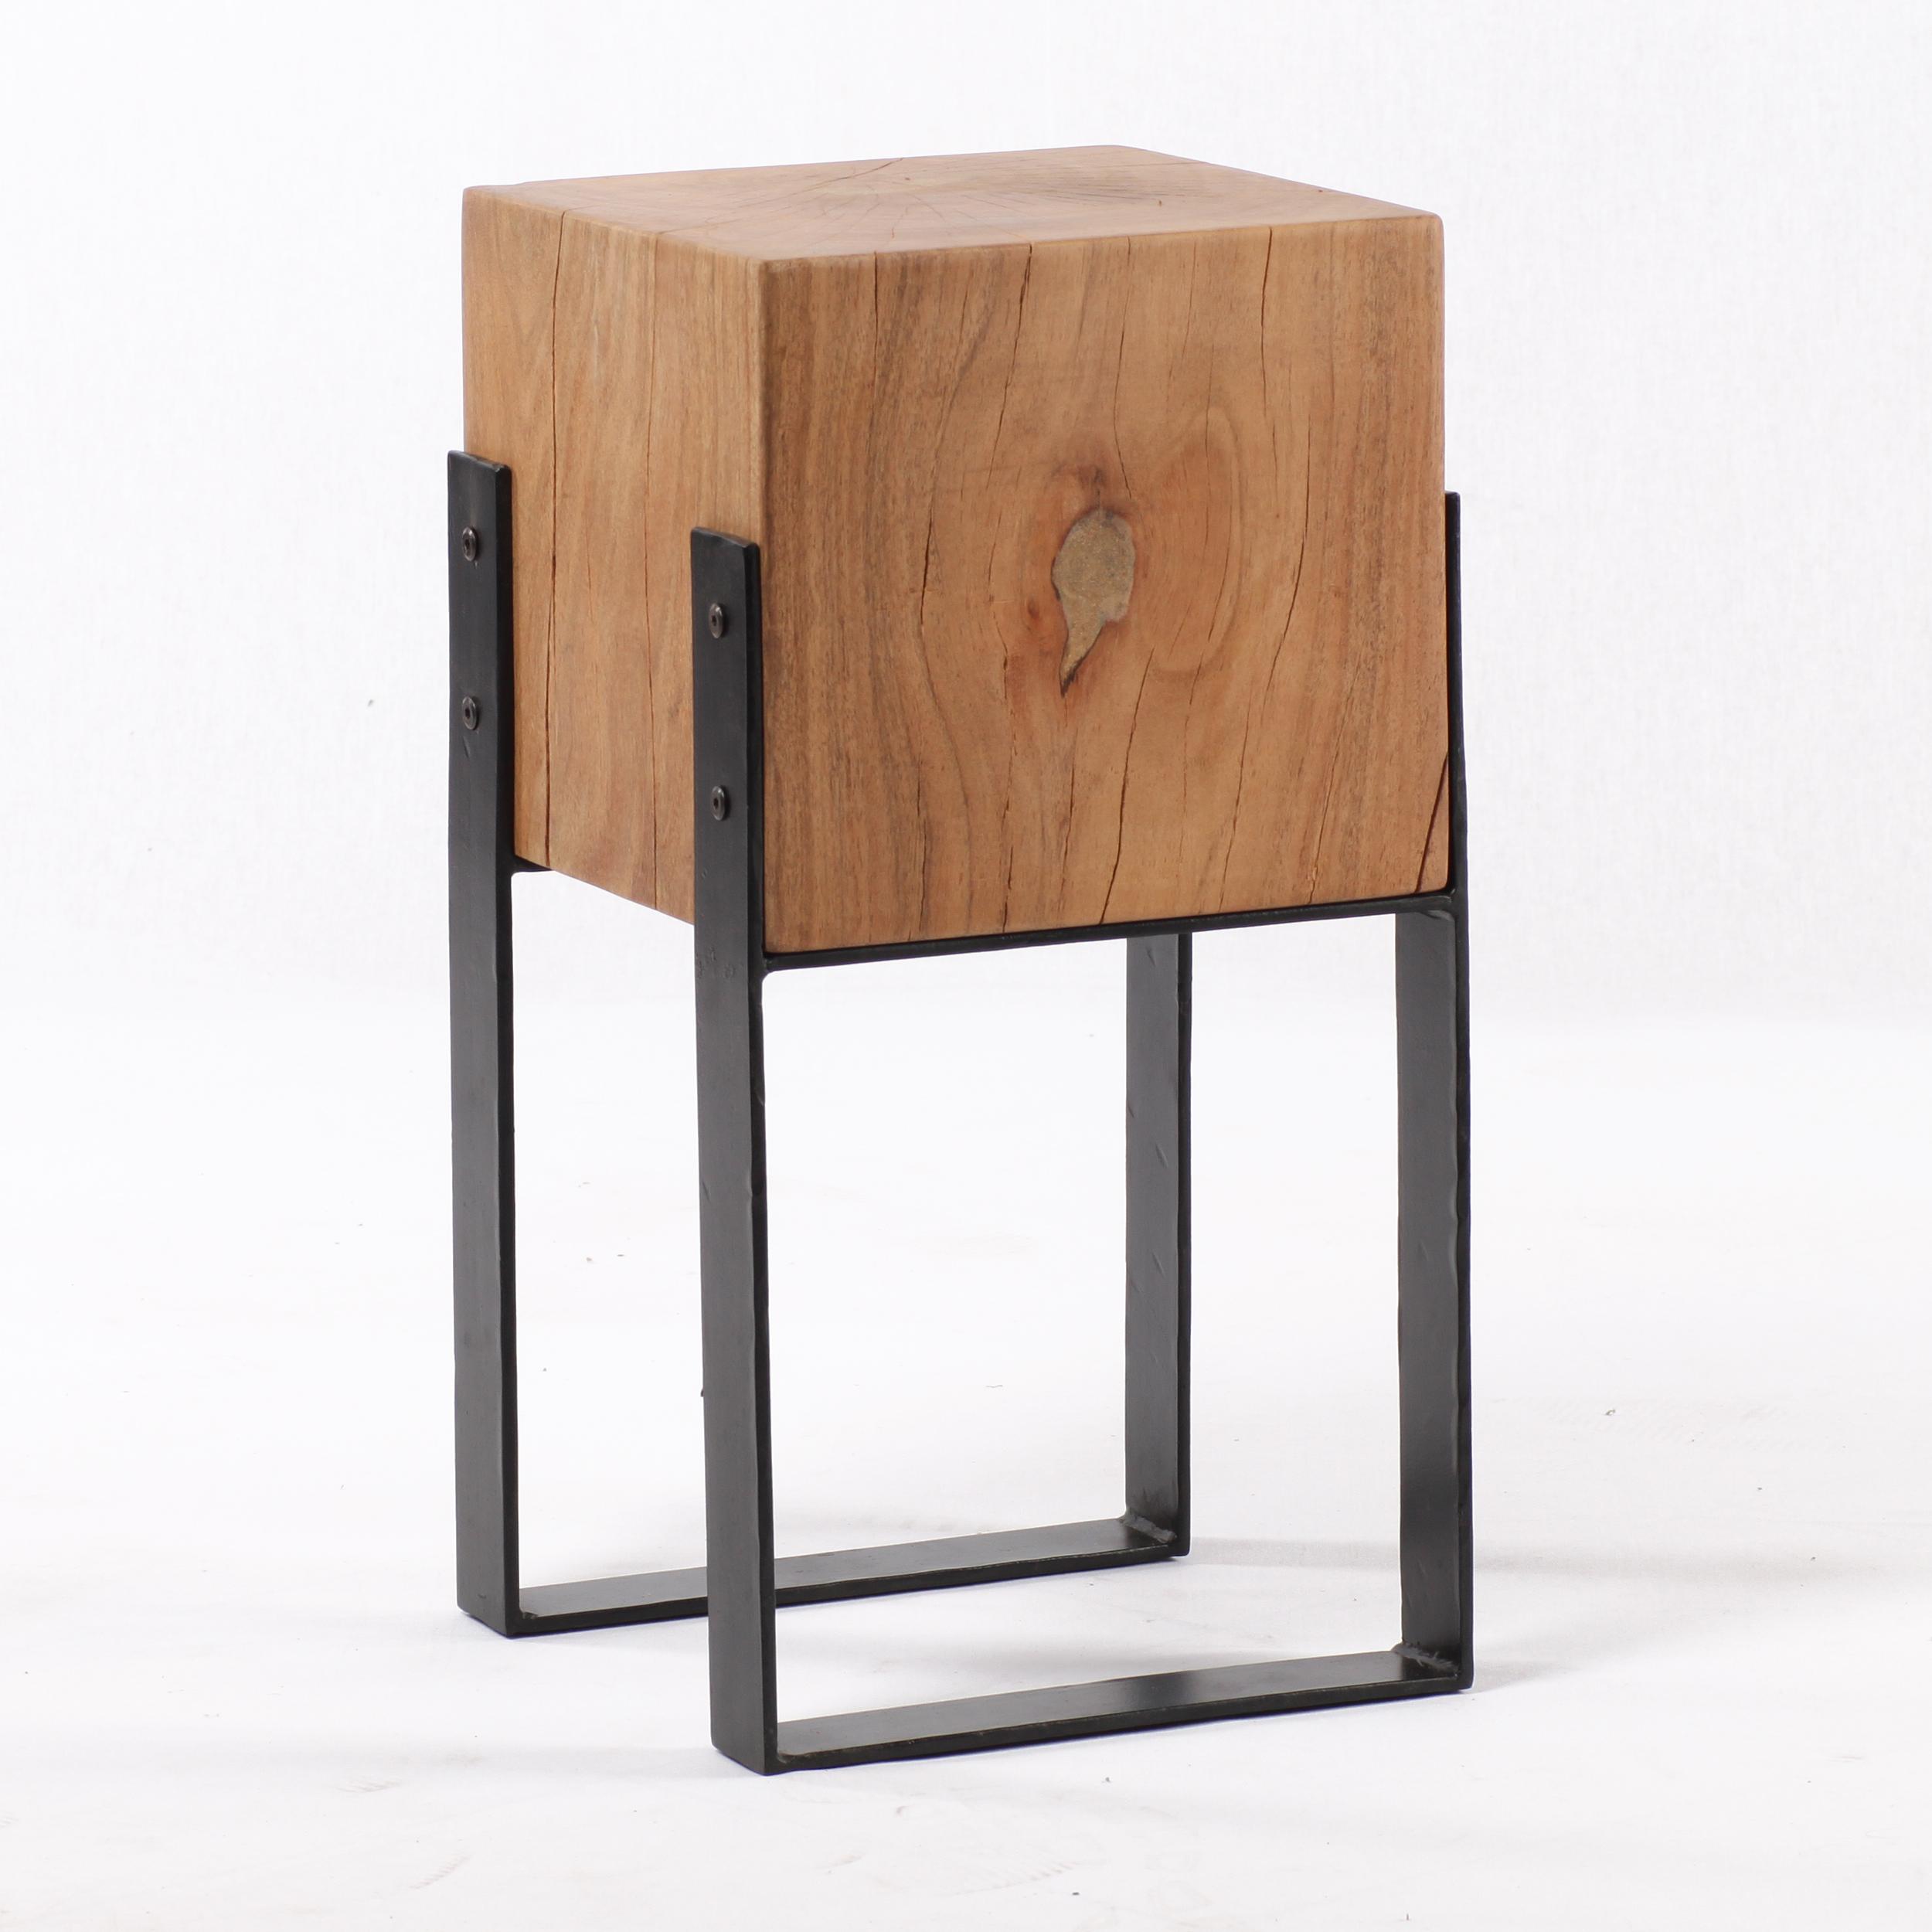 hocker massivholz akazie natur 29x29x55. Black Bedroom Furniture Sets. Home Design Ideas